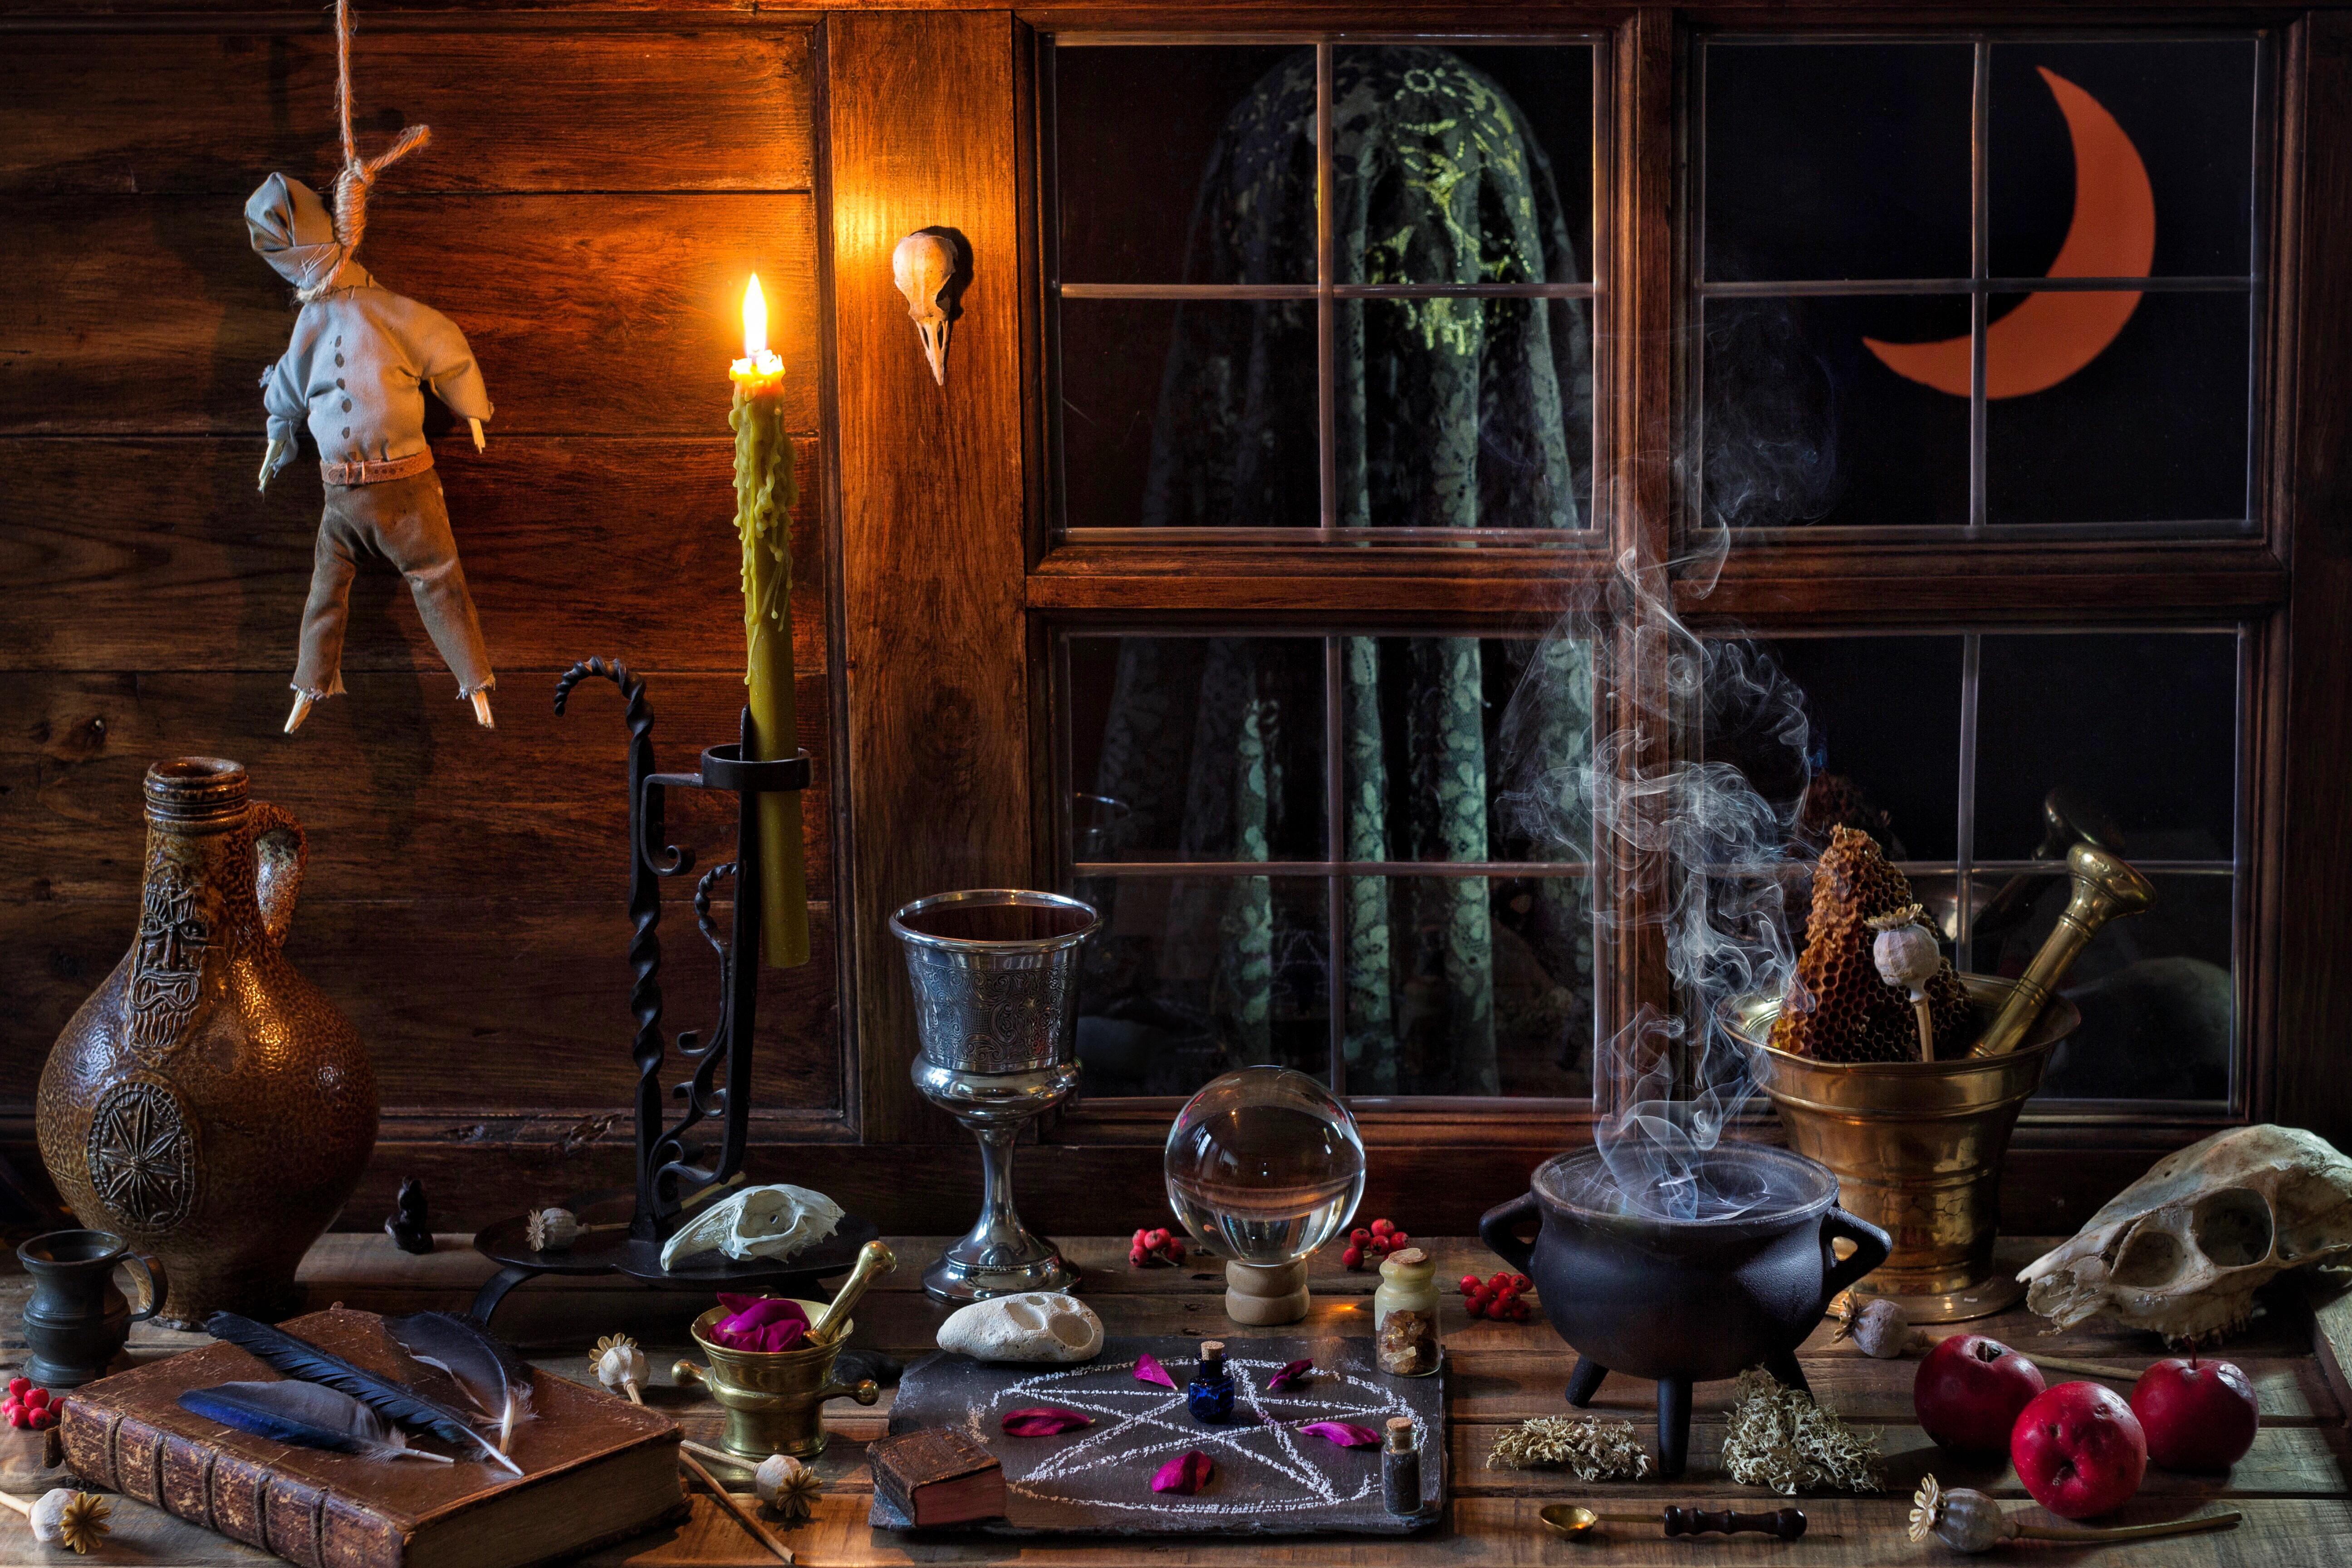 обои стол, свеча, книга, кувшин картинки фото